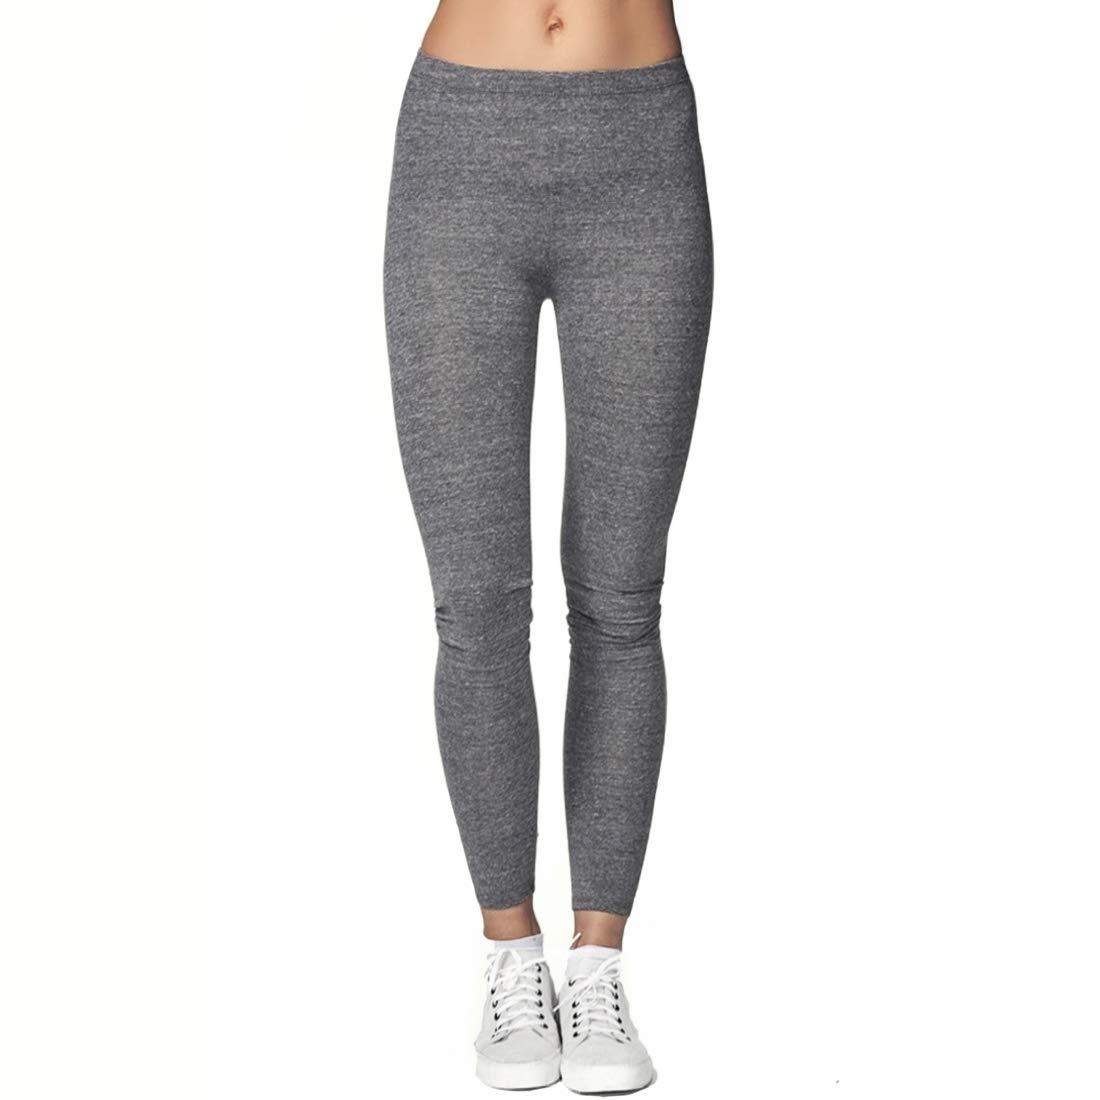 d777f7063720e5 Women's Organic Cotton & Eco Friendly Leggings (Small, Heather Grey) at  Amazon Women's Clothing store: